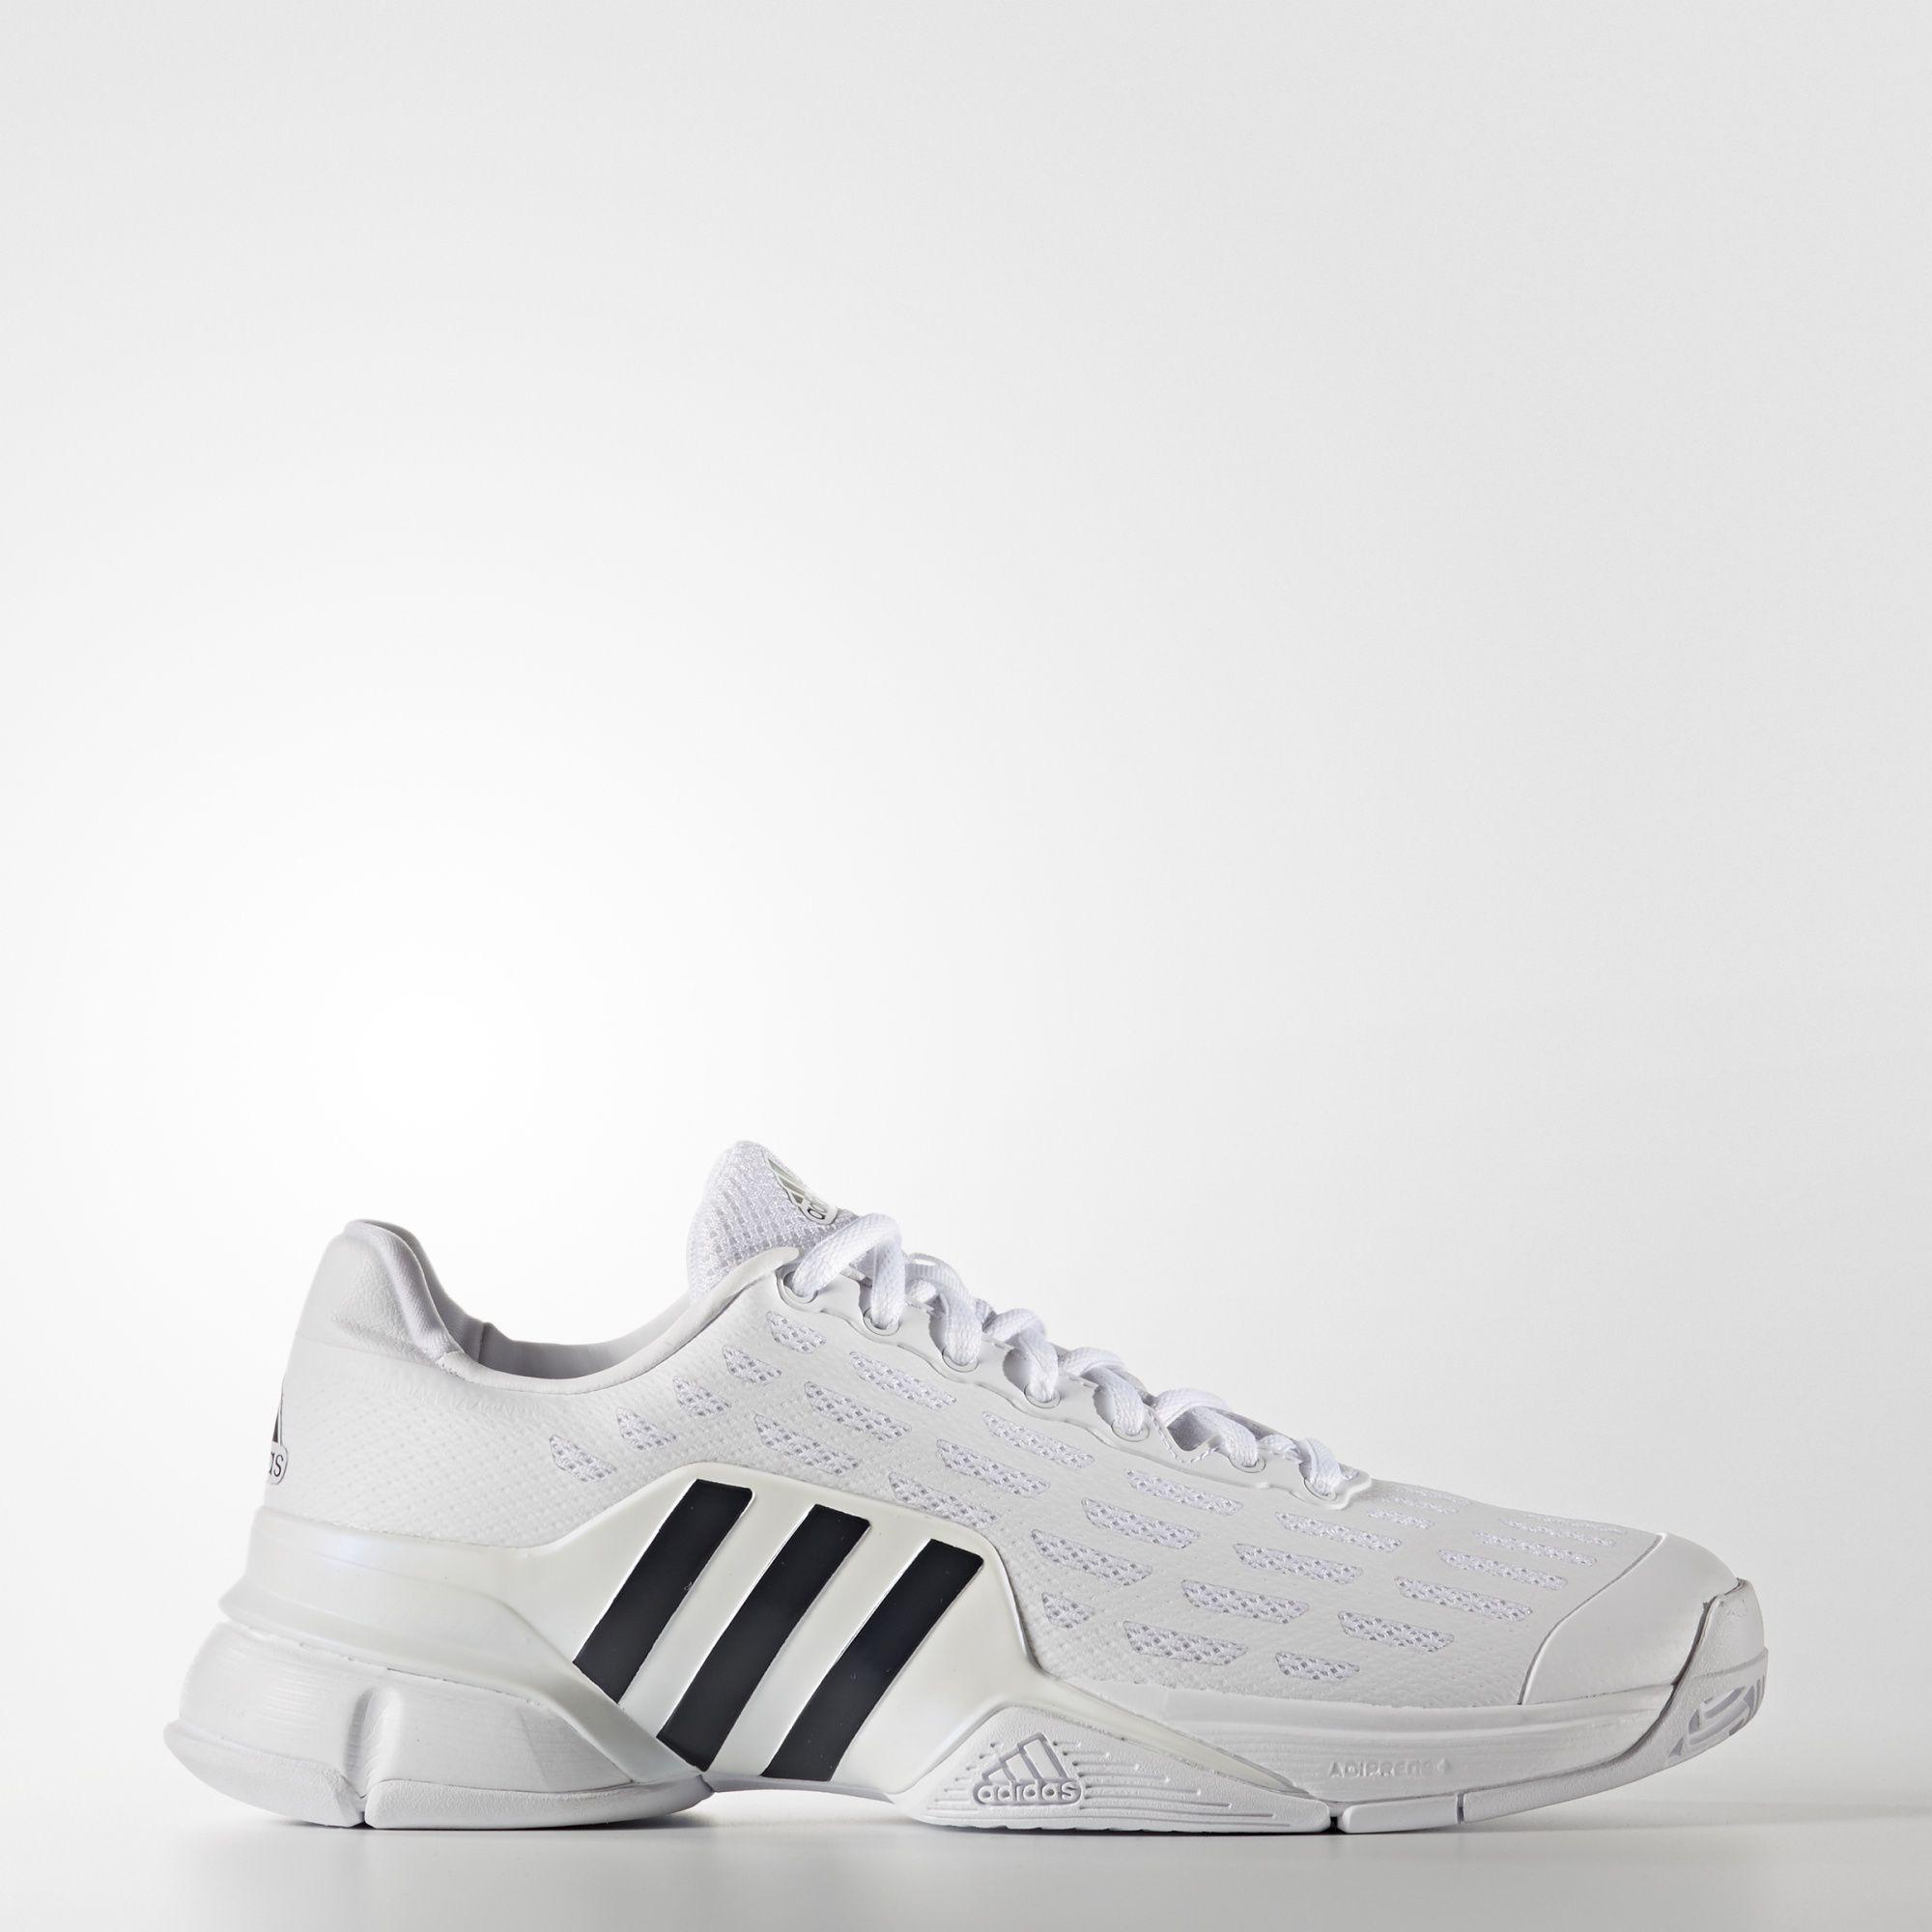 hot sale online 4f491 eccf0 Adidas Mens Barricade 2016 Tennis Shoes - White - Tennisnuts.com